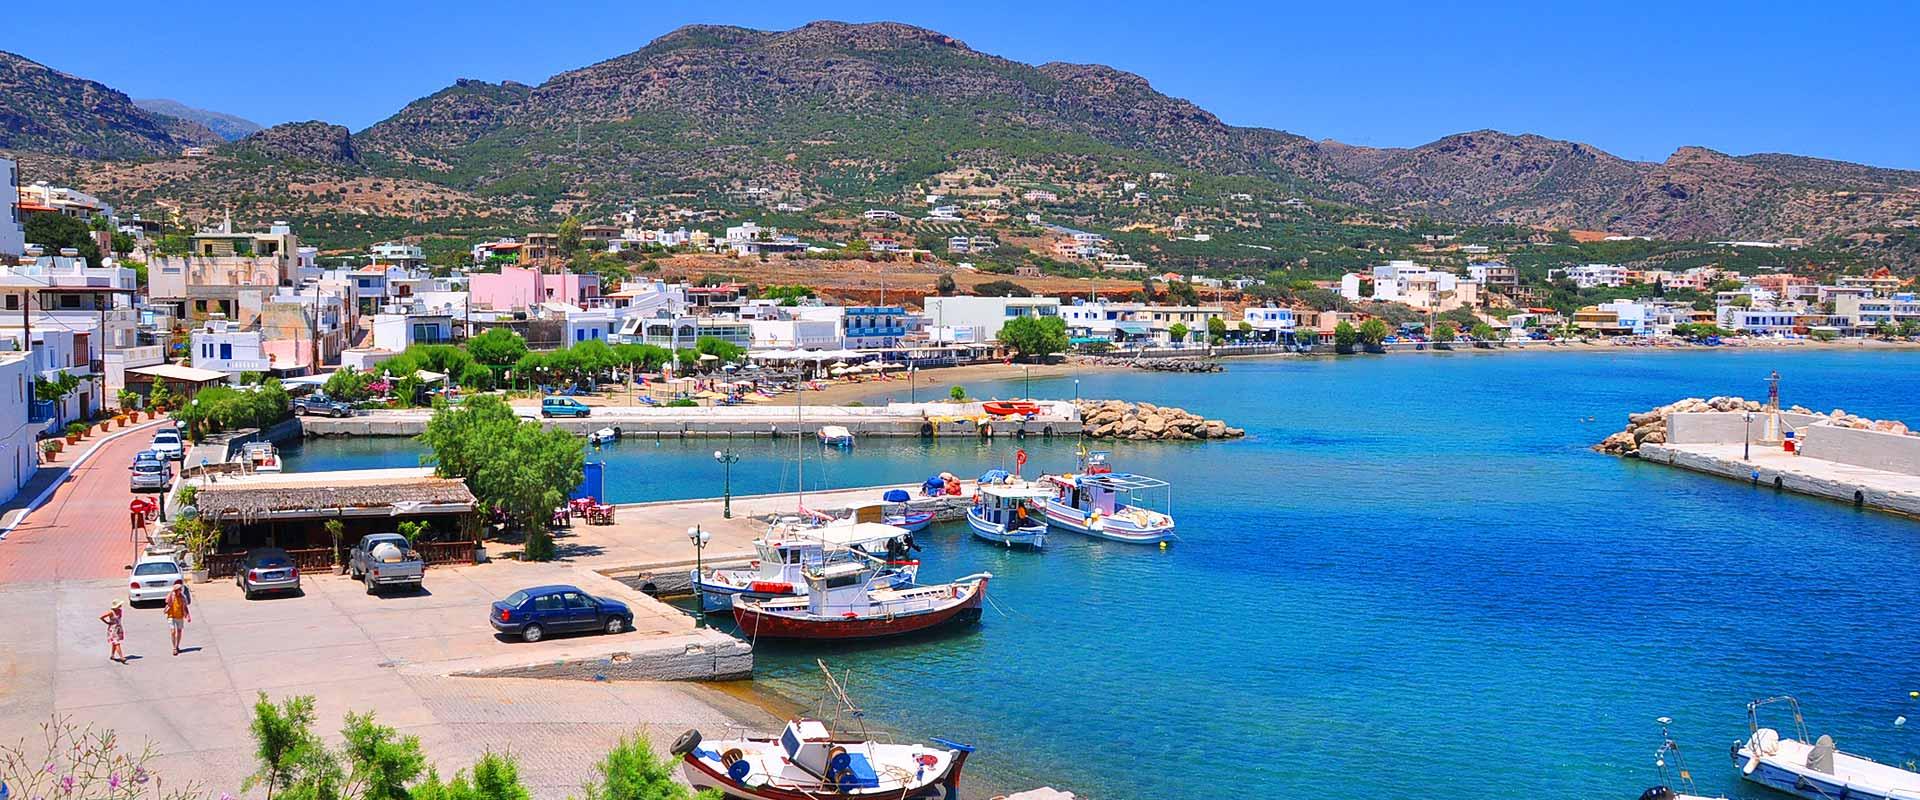 Carte Crete Stavromenos.Makrigialos Village East Crete Ierapetra Sitia